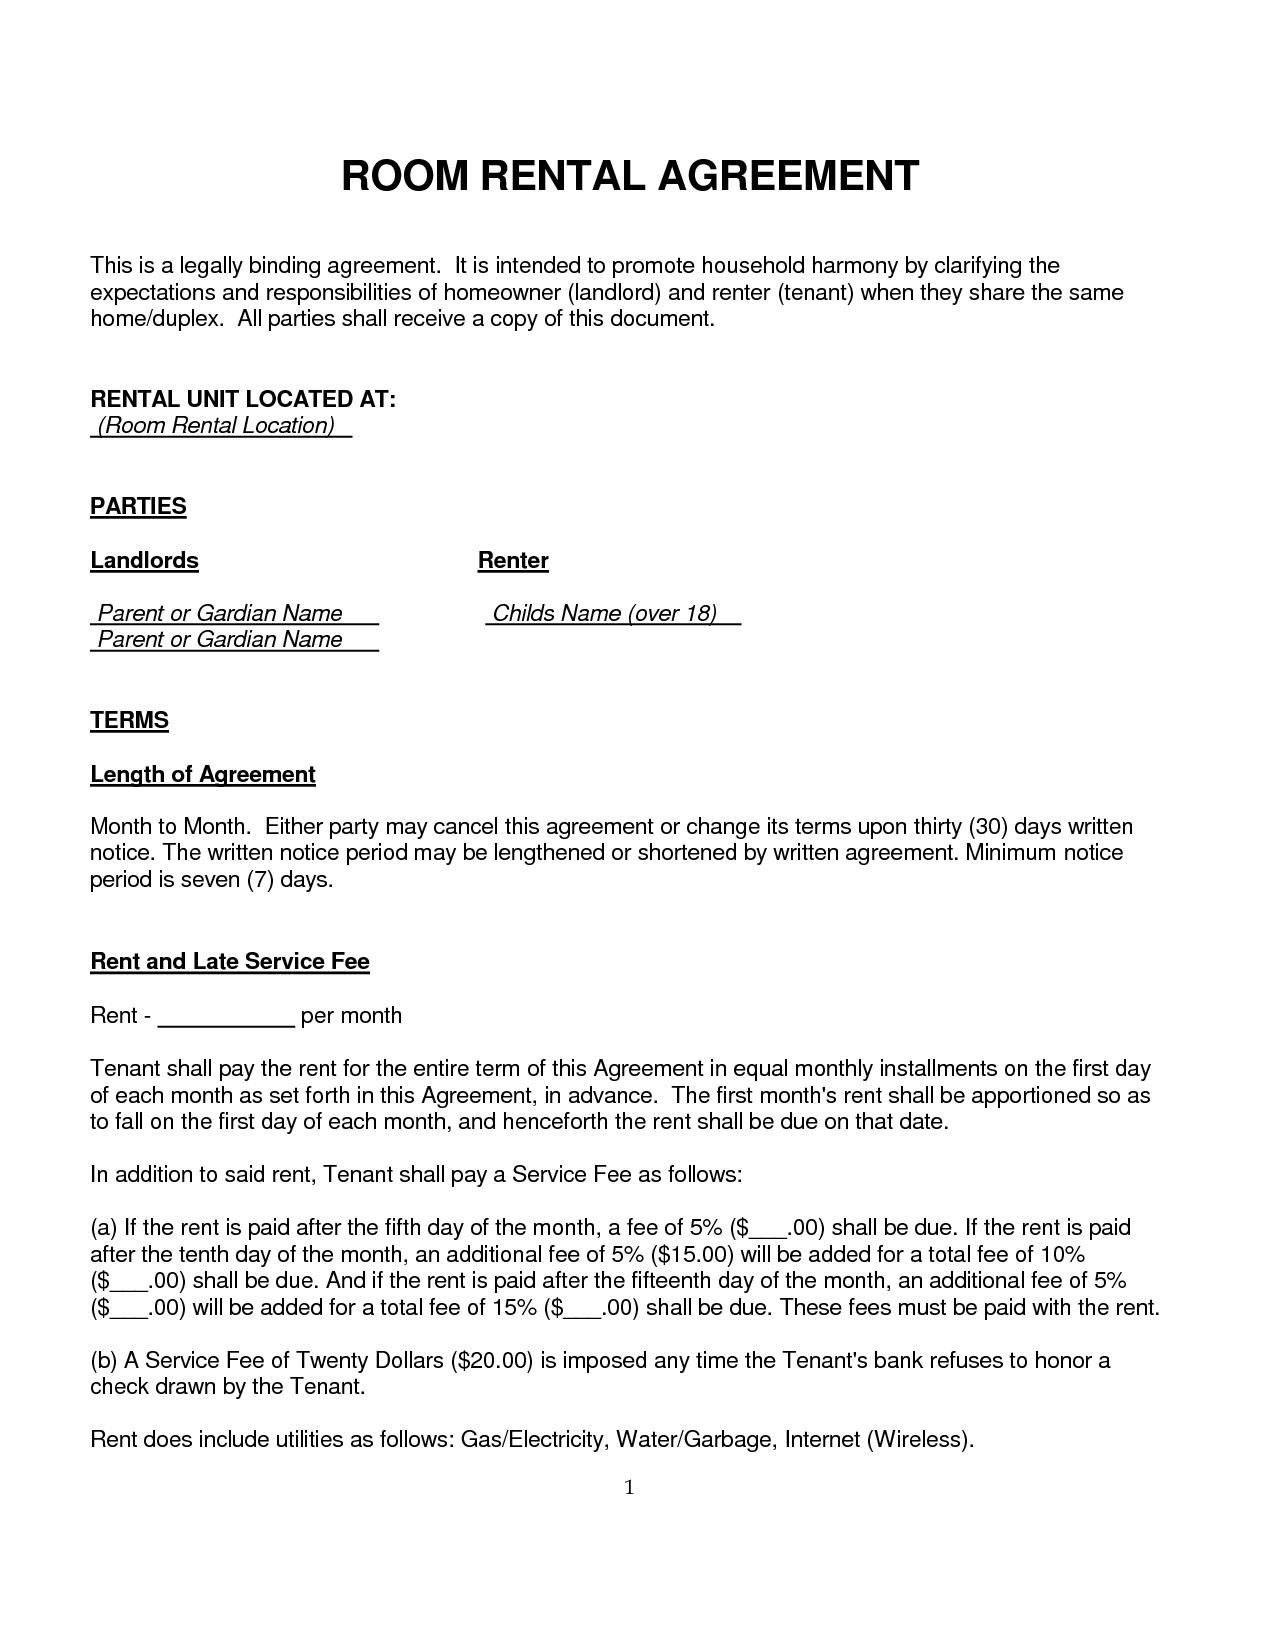 Tenancy Agreement Template Uk Gfkemltmg 12751650 House And